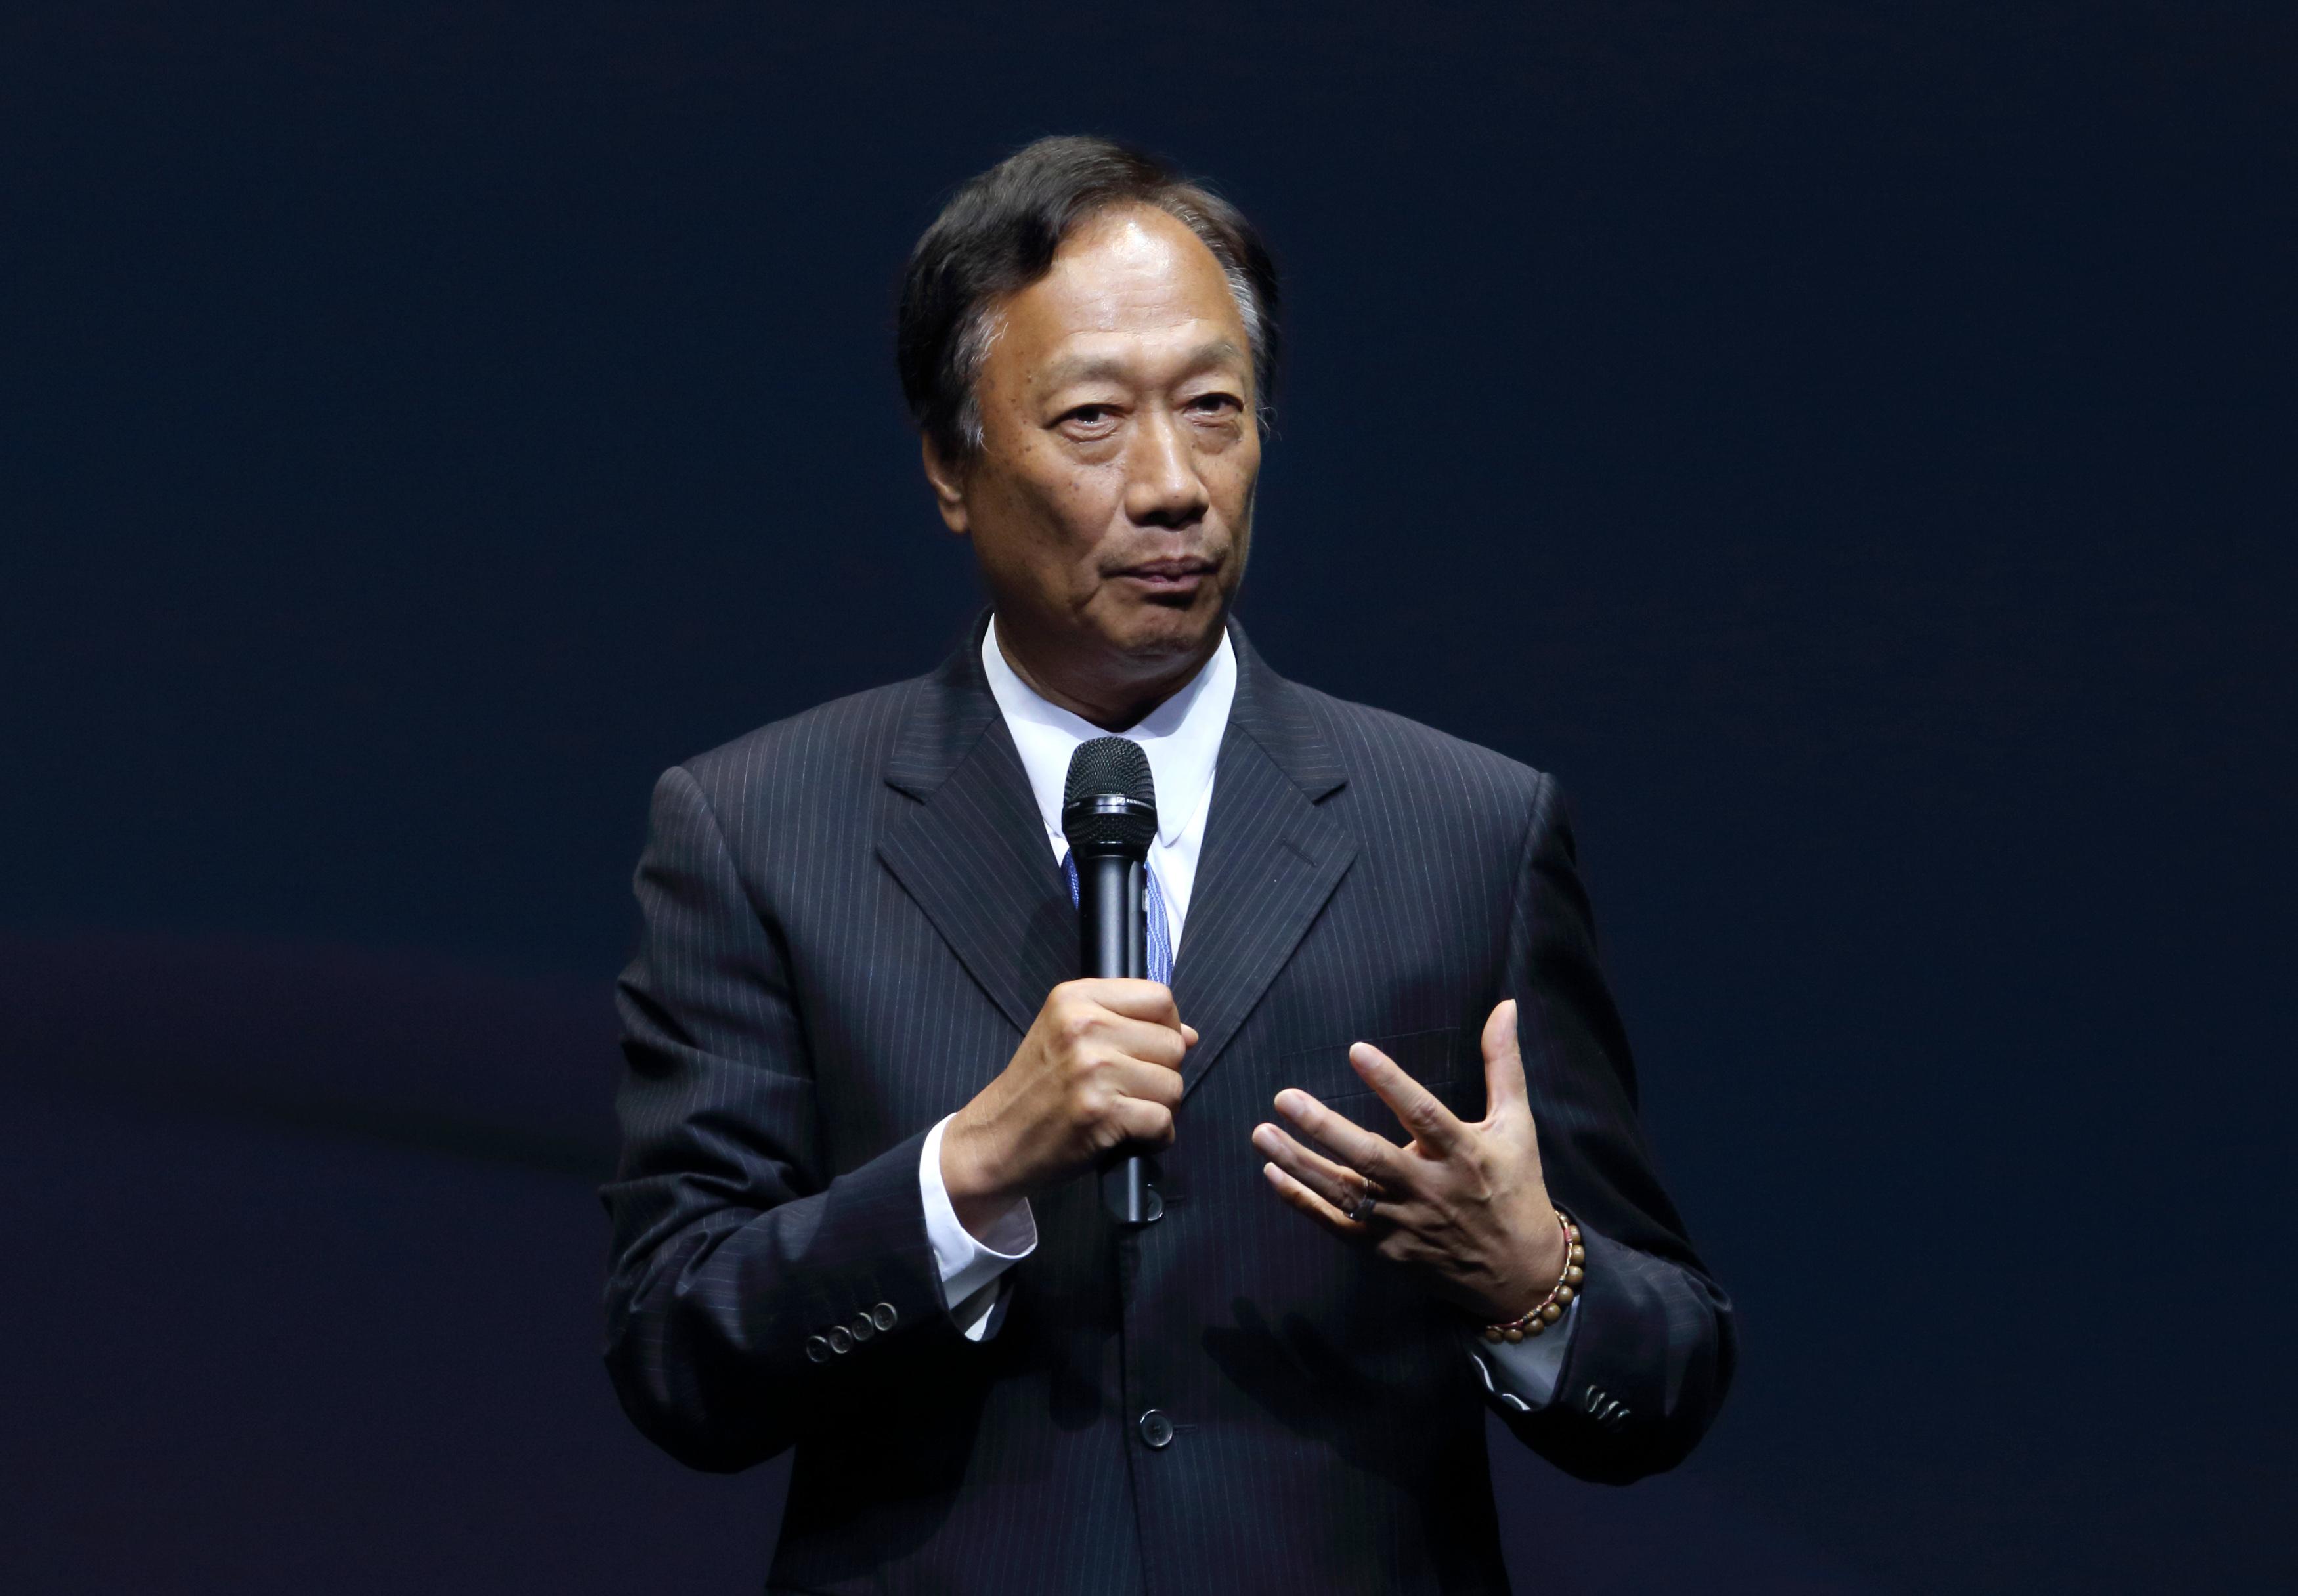 Softbank Chief Executive Officer Masayoshi Son News Conference